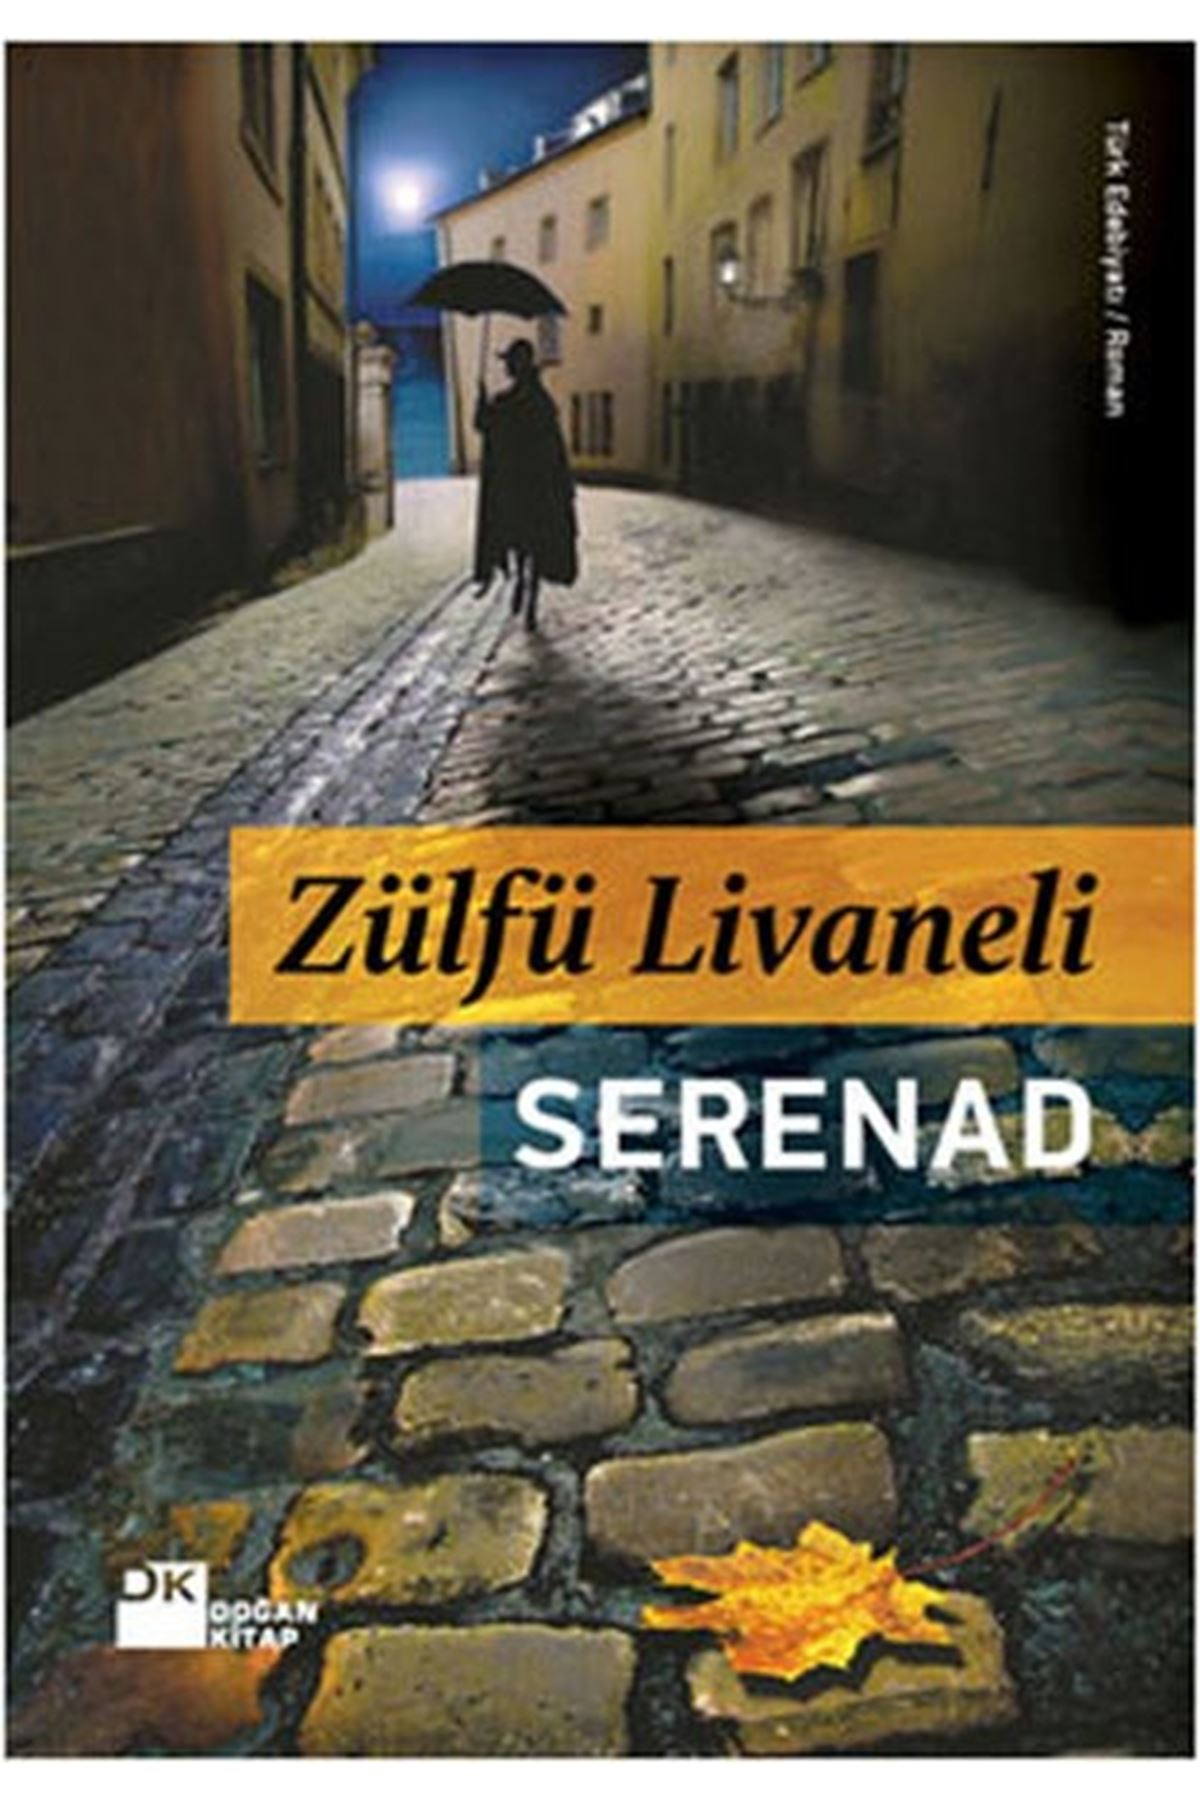 ZÜLFÜ LİVANELİ - SERENAD